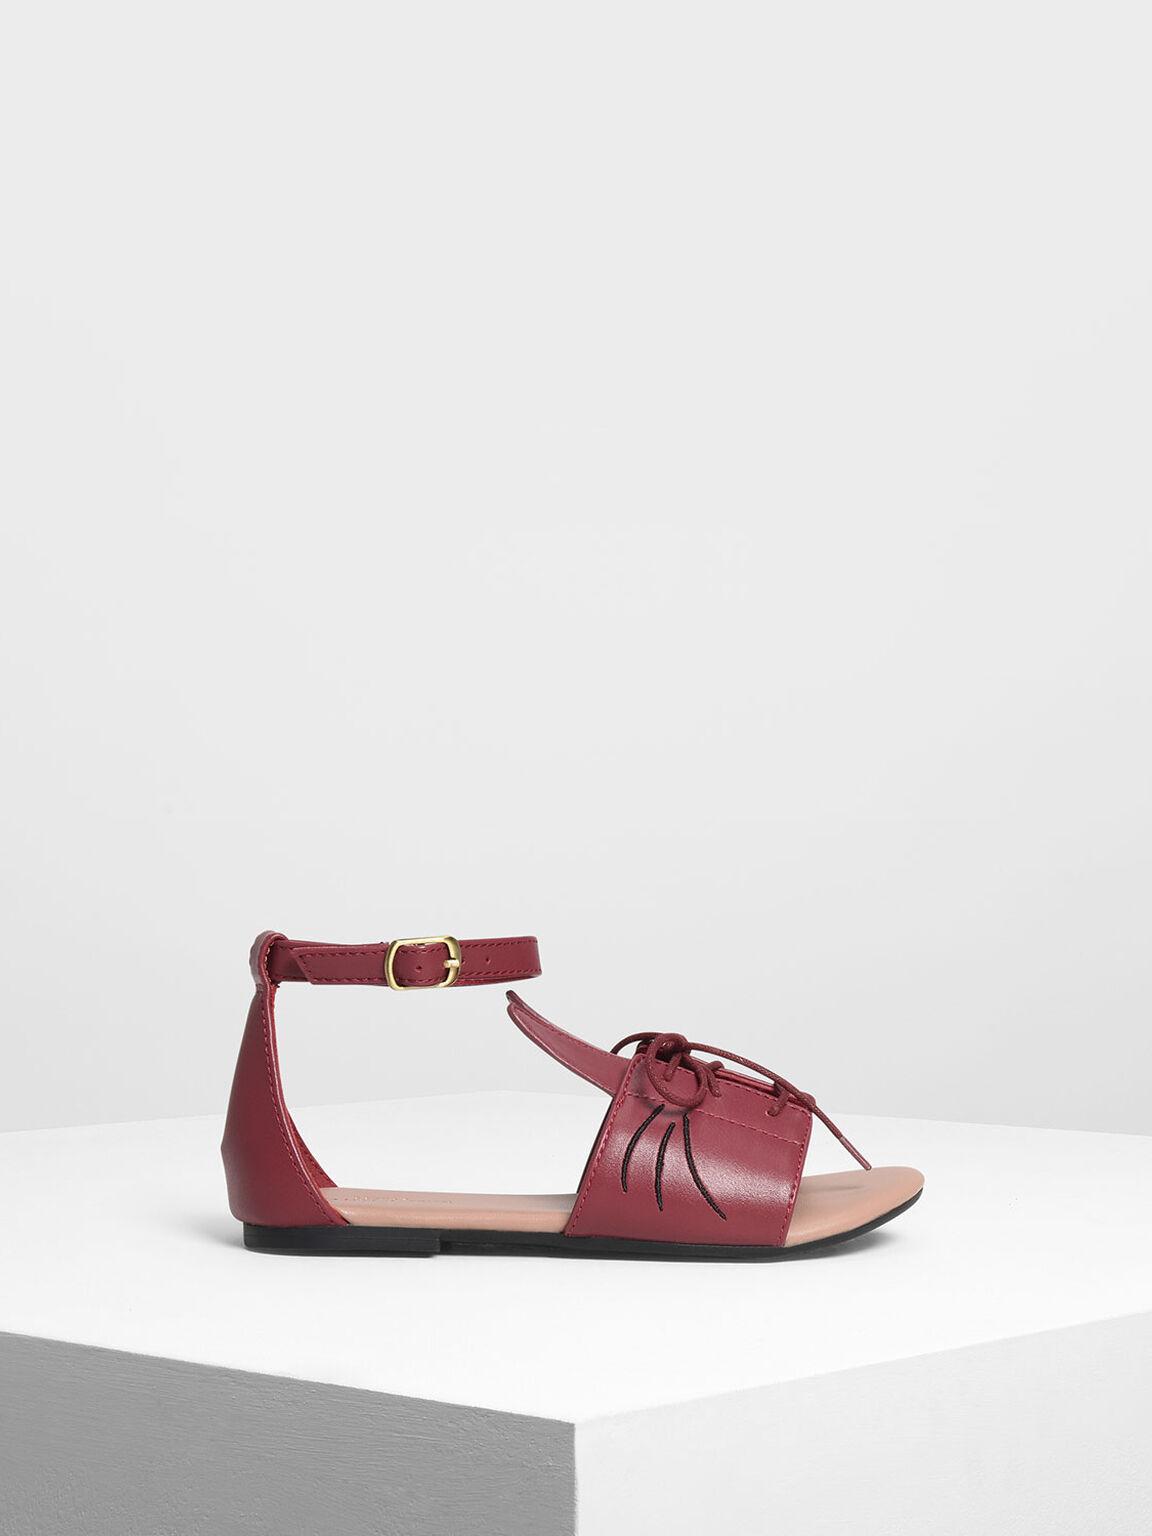 Kids Bunny Sandals, Red, hi-res